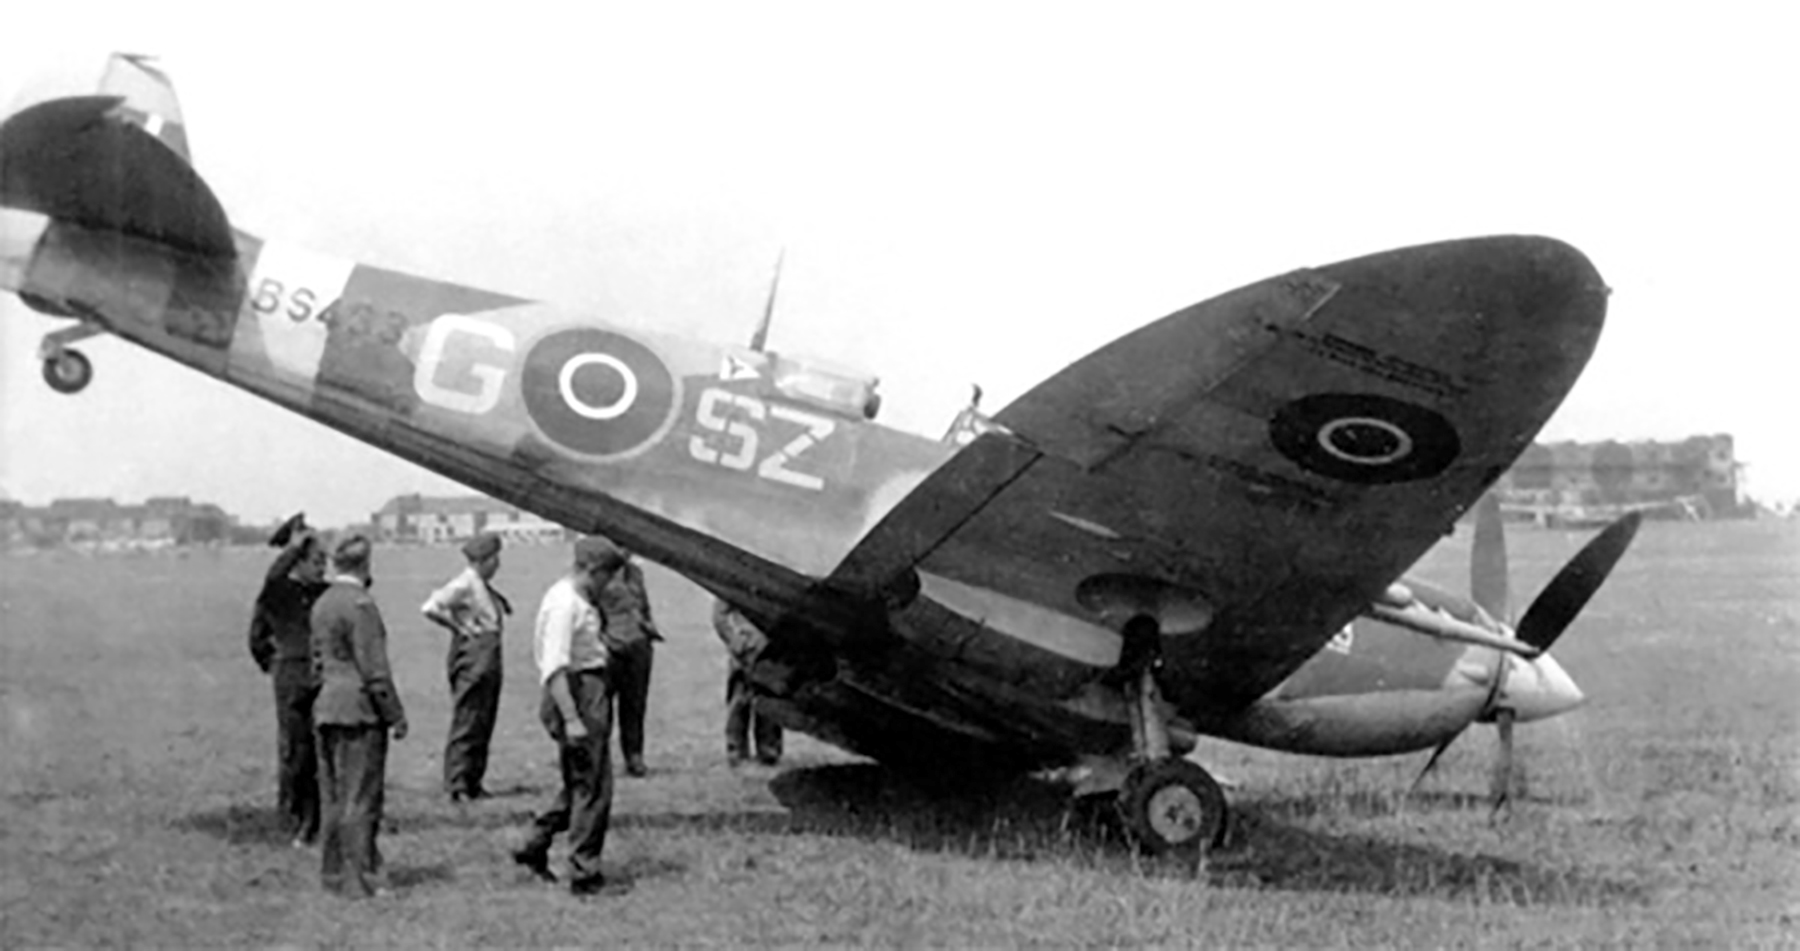 Spitfire MkIX RAF 316Sqn SZG Jan Falkowski BS433 landing accident June 11 1943